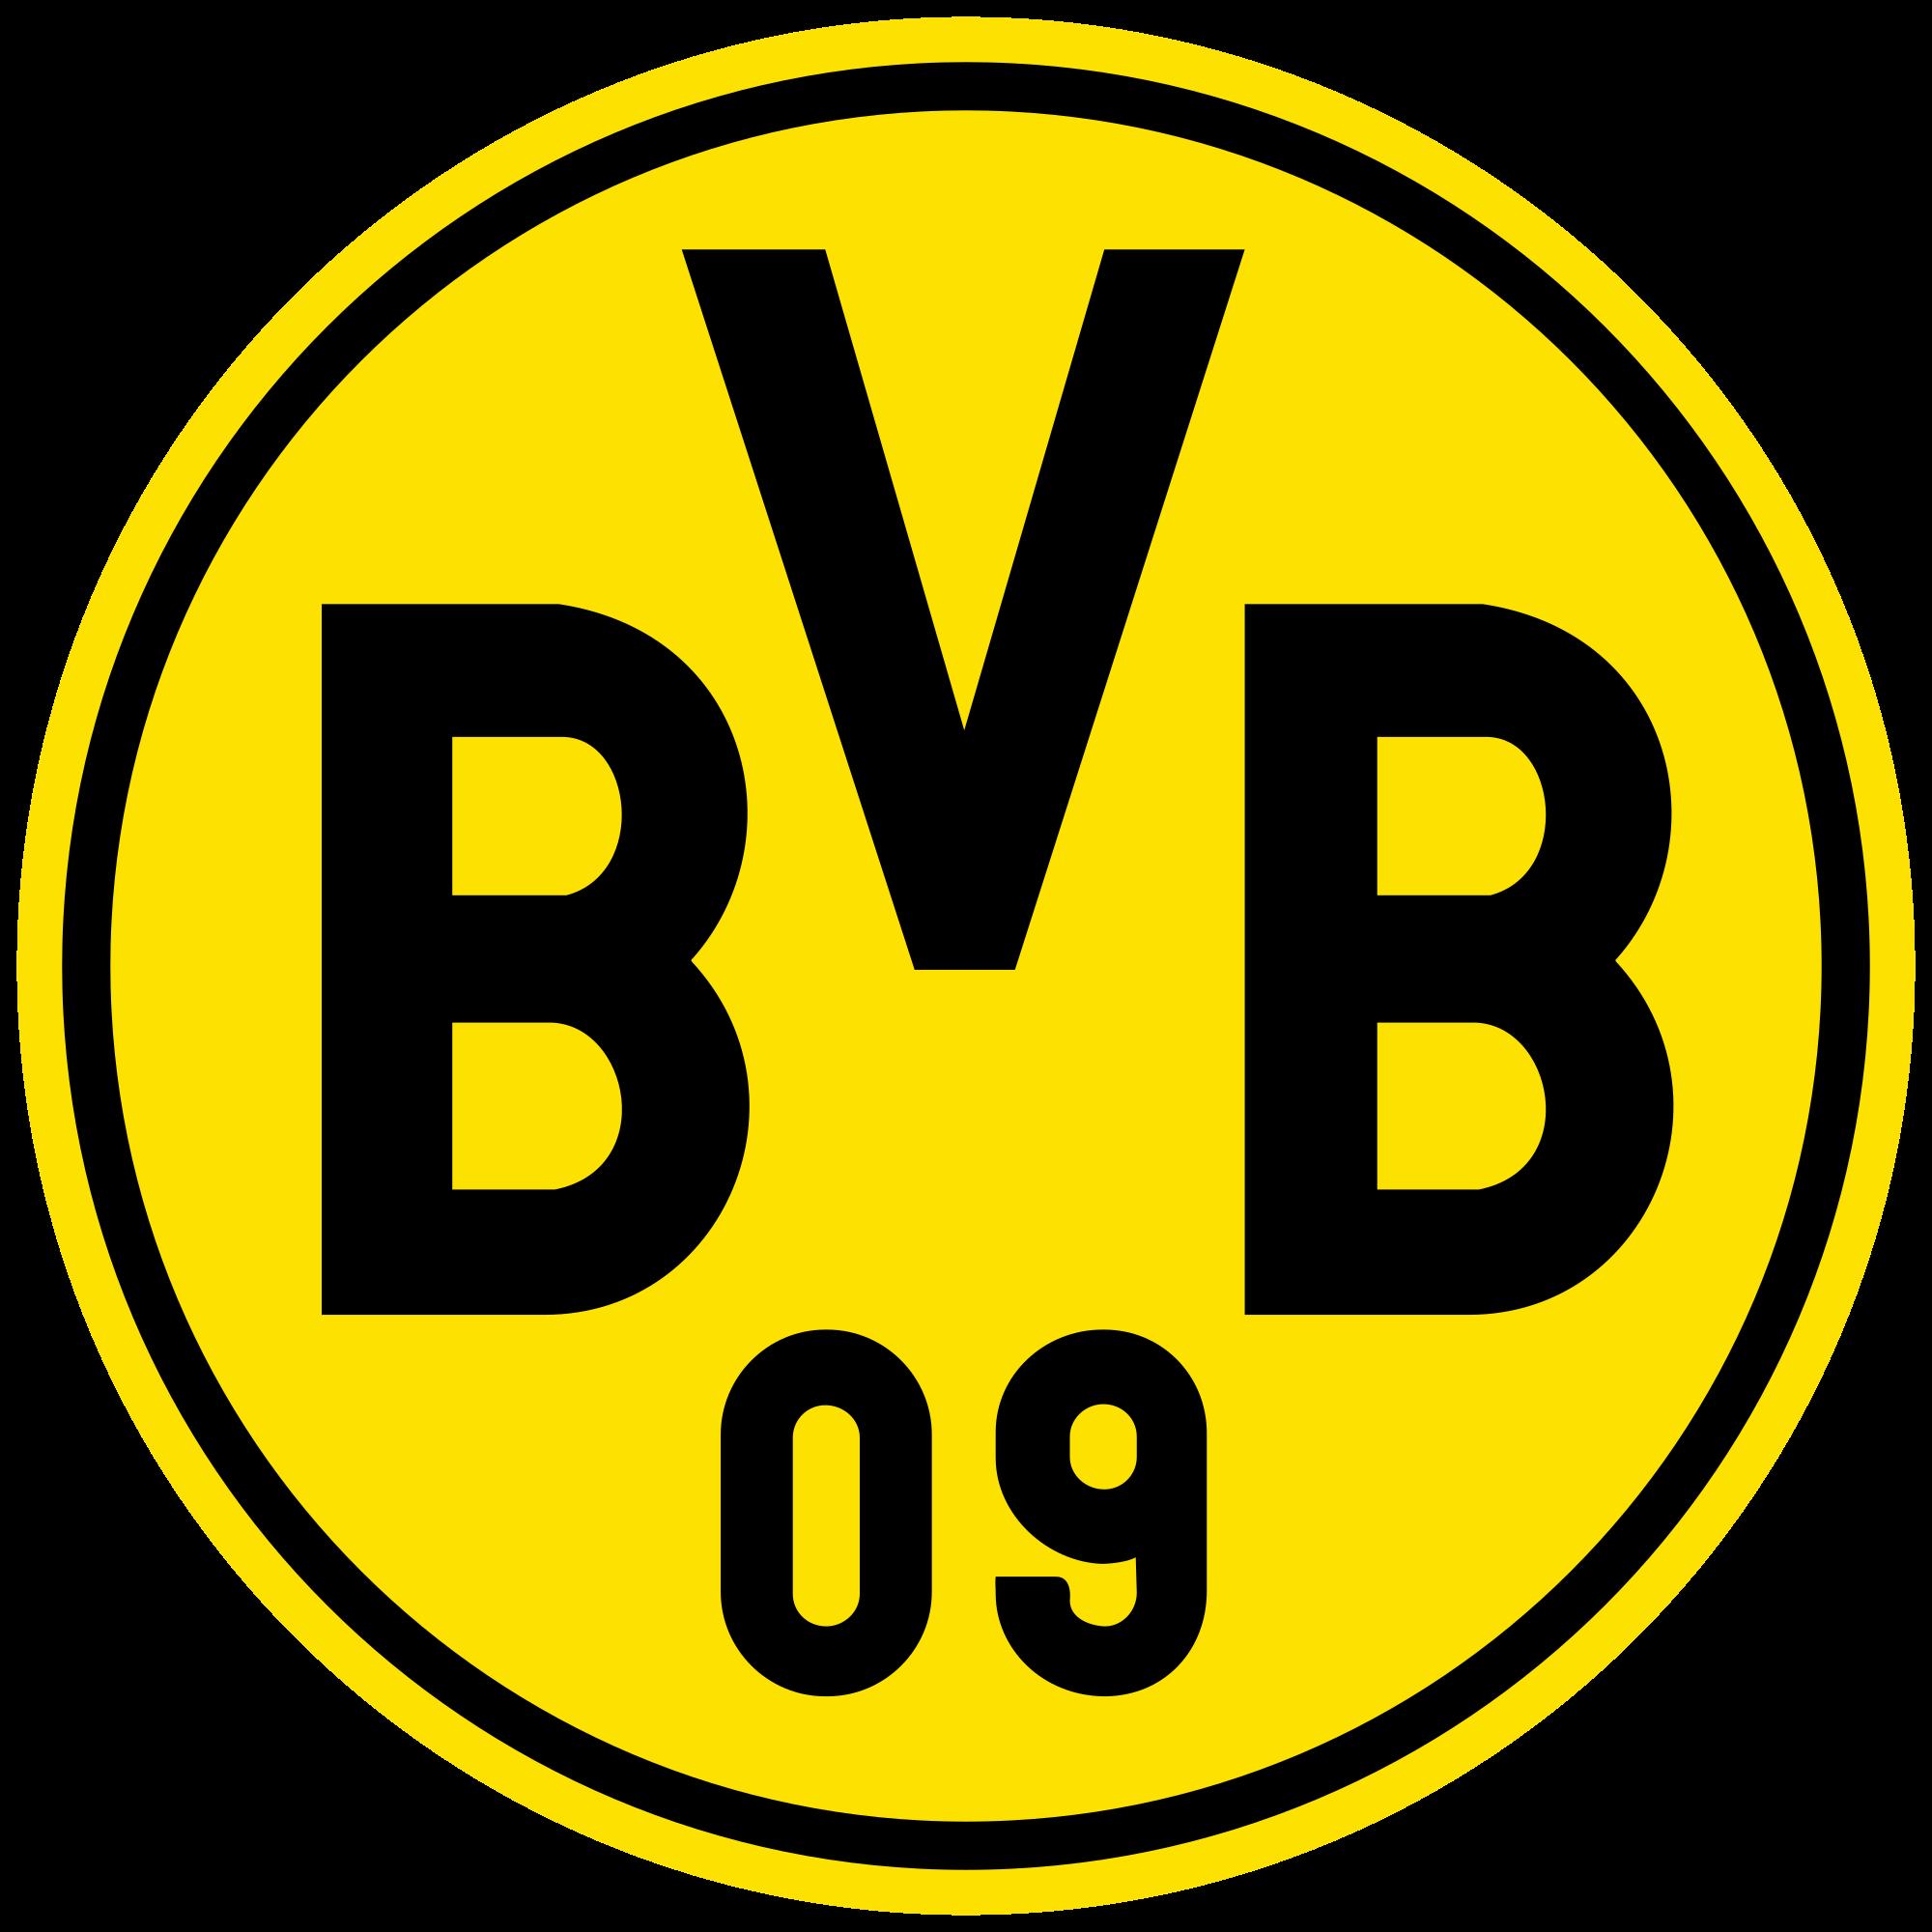 Soccer-Dortmund demolish Holstein Kiel 5-0 to reach German Cup final